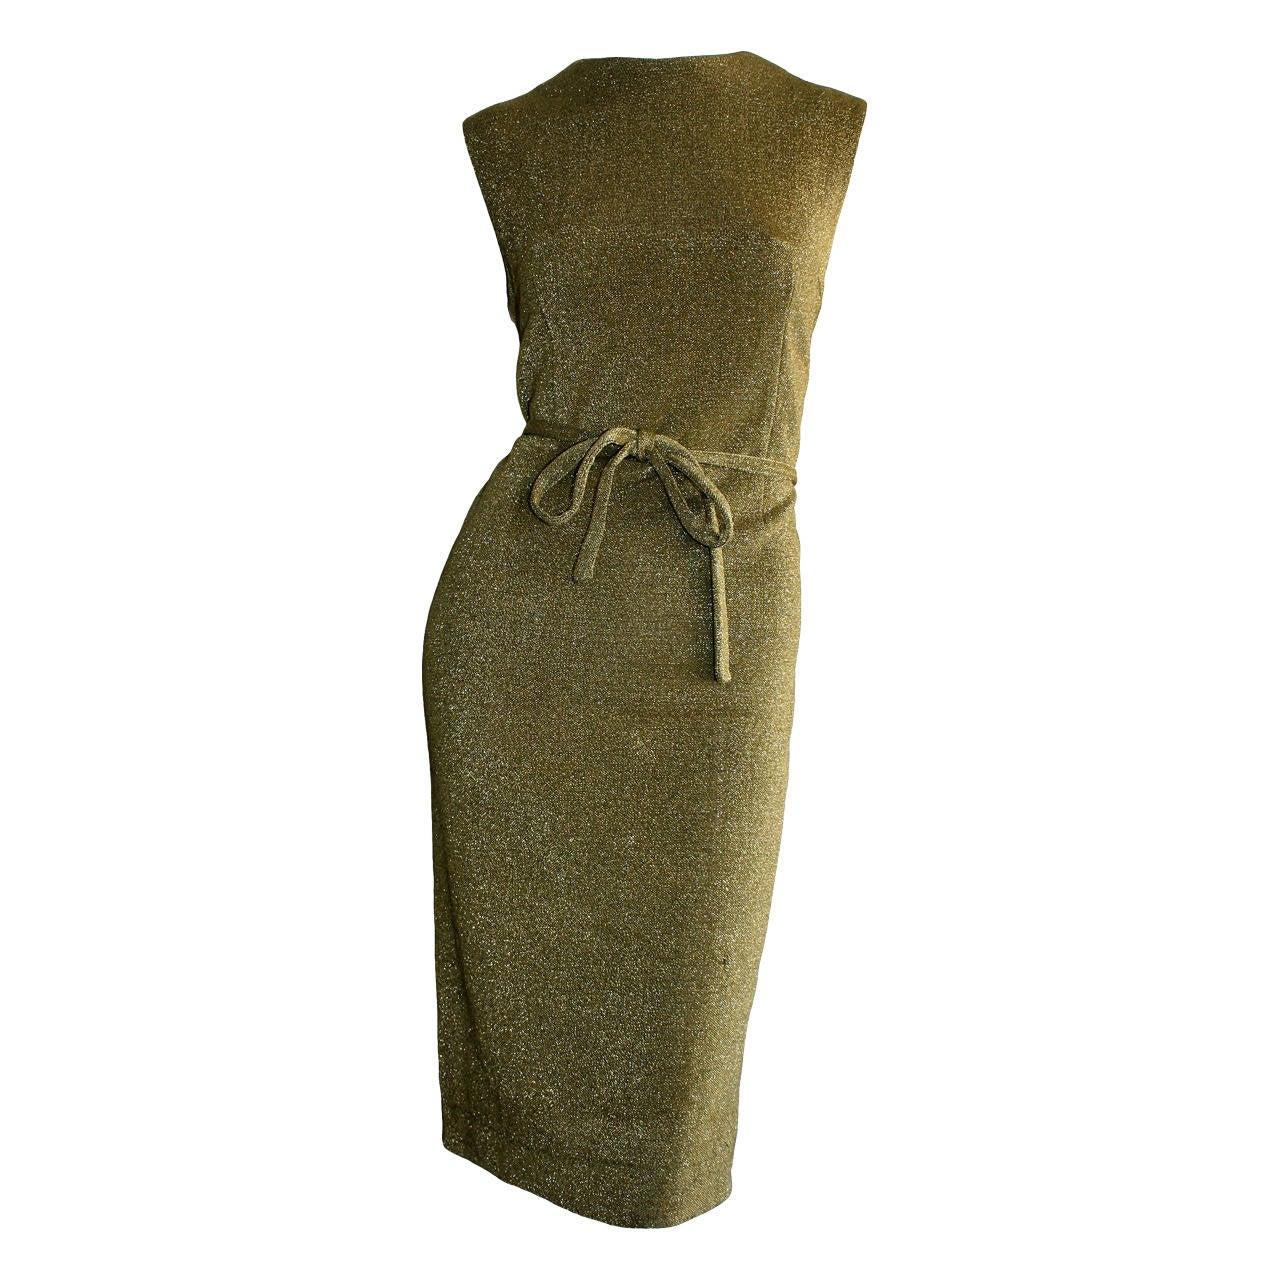 Rudi Gernreich For Harmon Knits 1960s Gold Metallic Dress 1